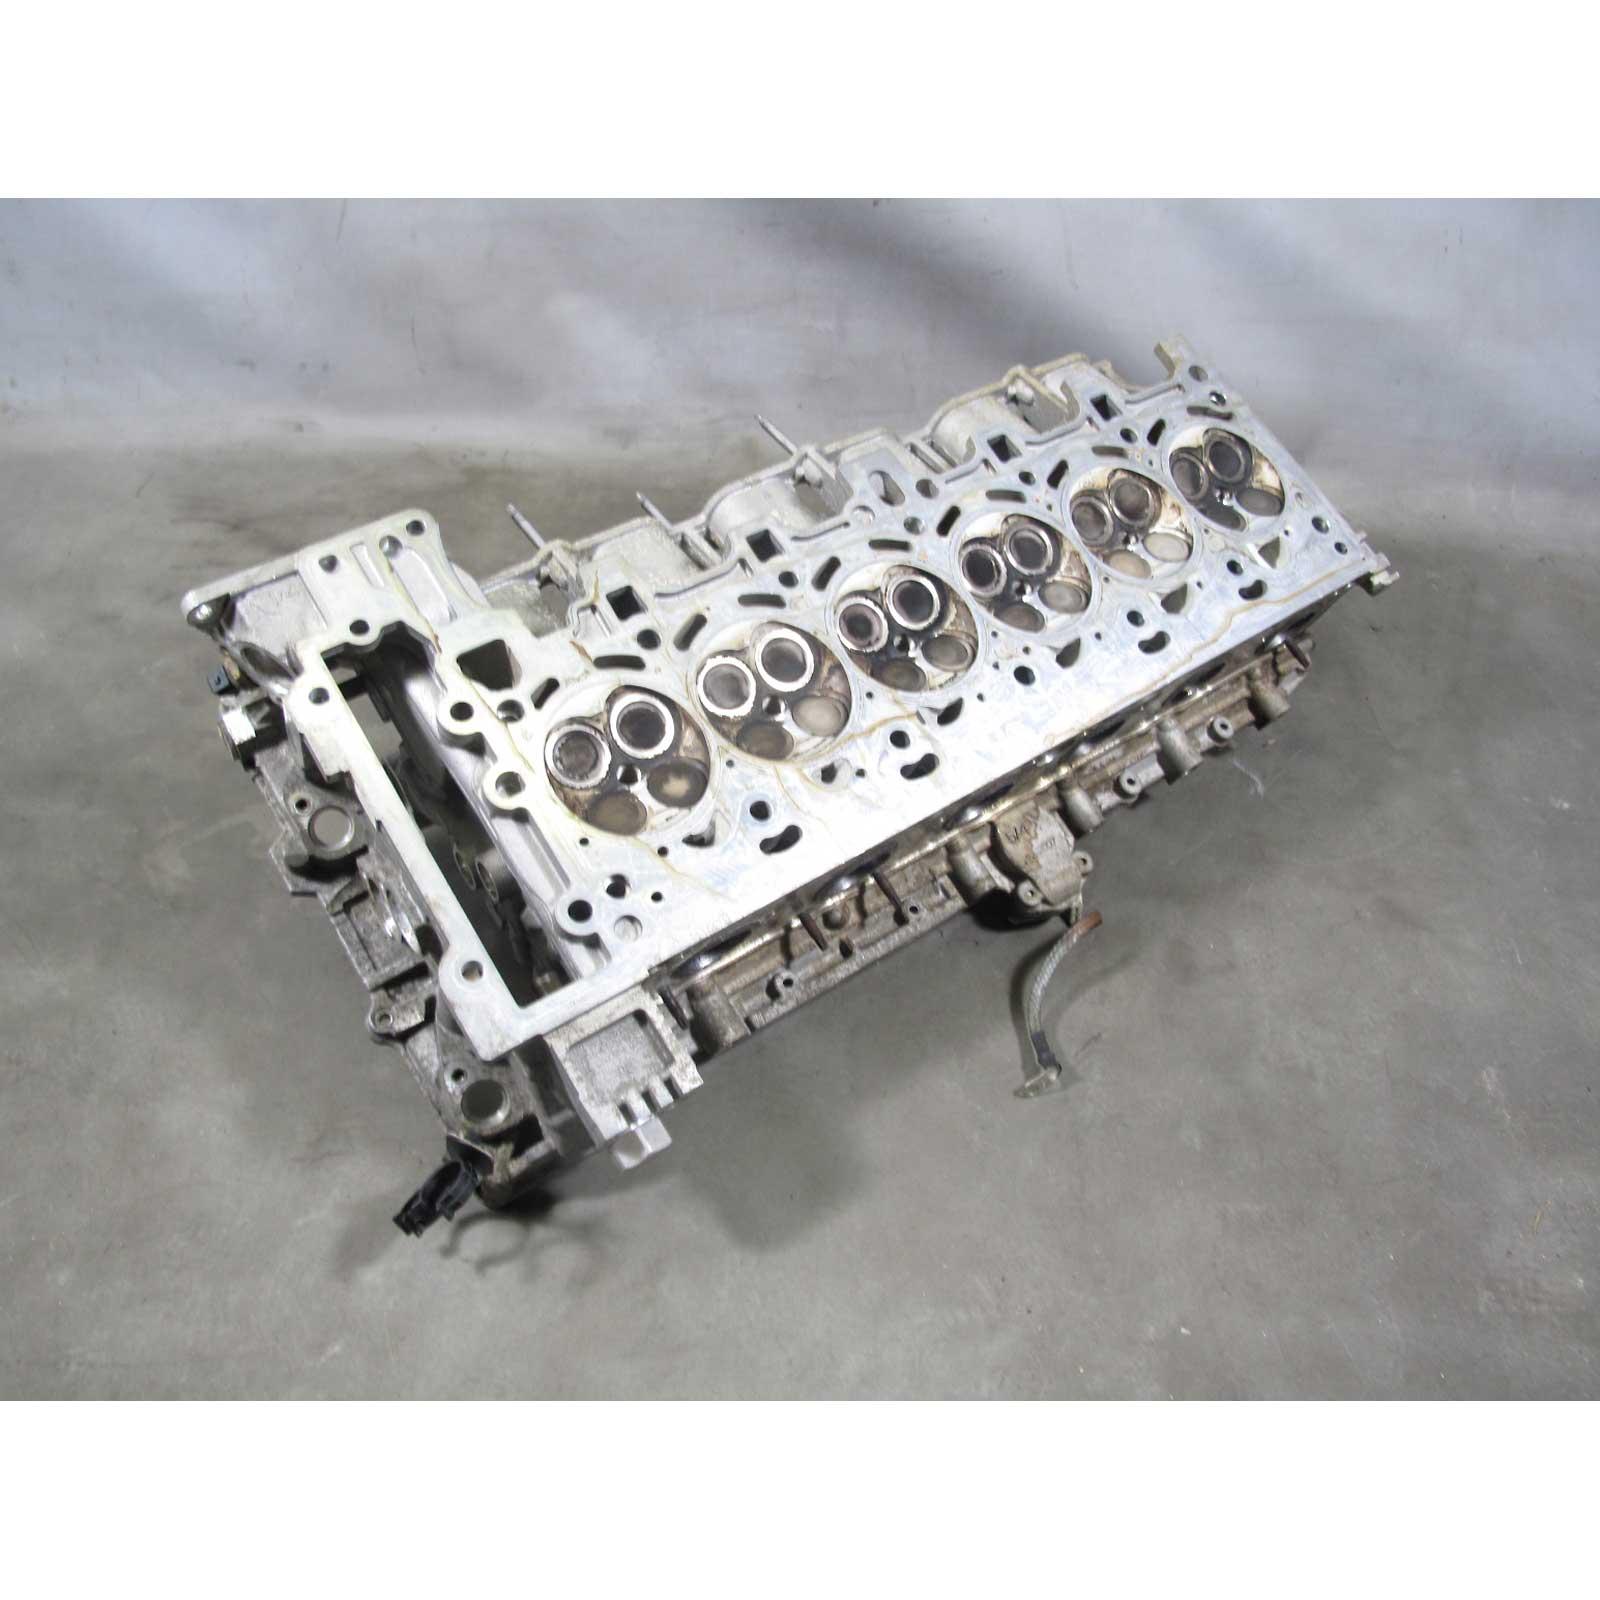 BMW N52 6-Cyl 3.0L Cylinder Head Assembly W Valves 2006